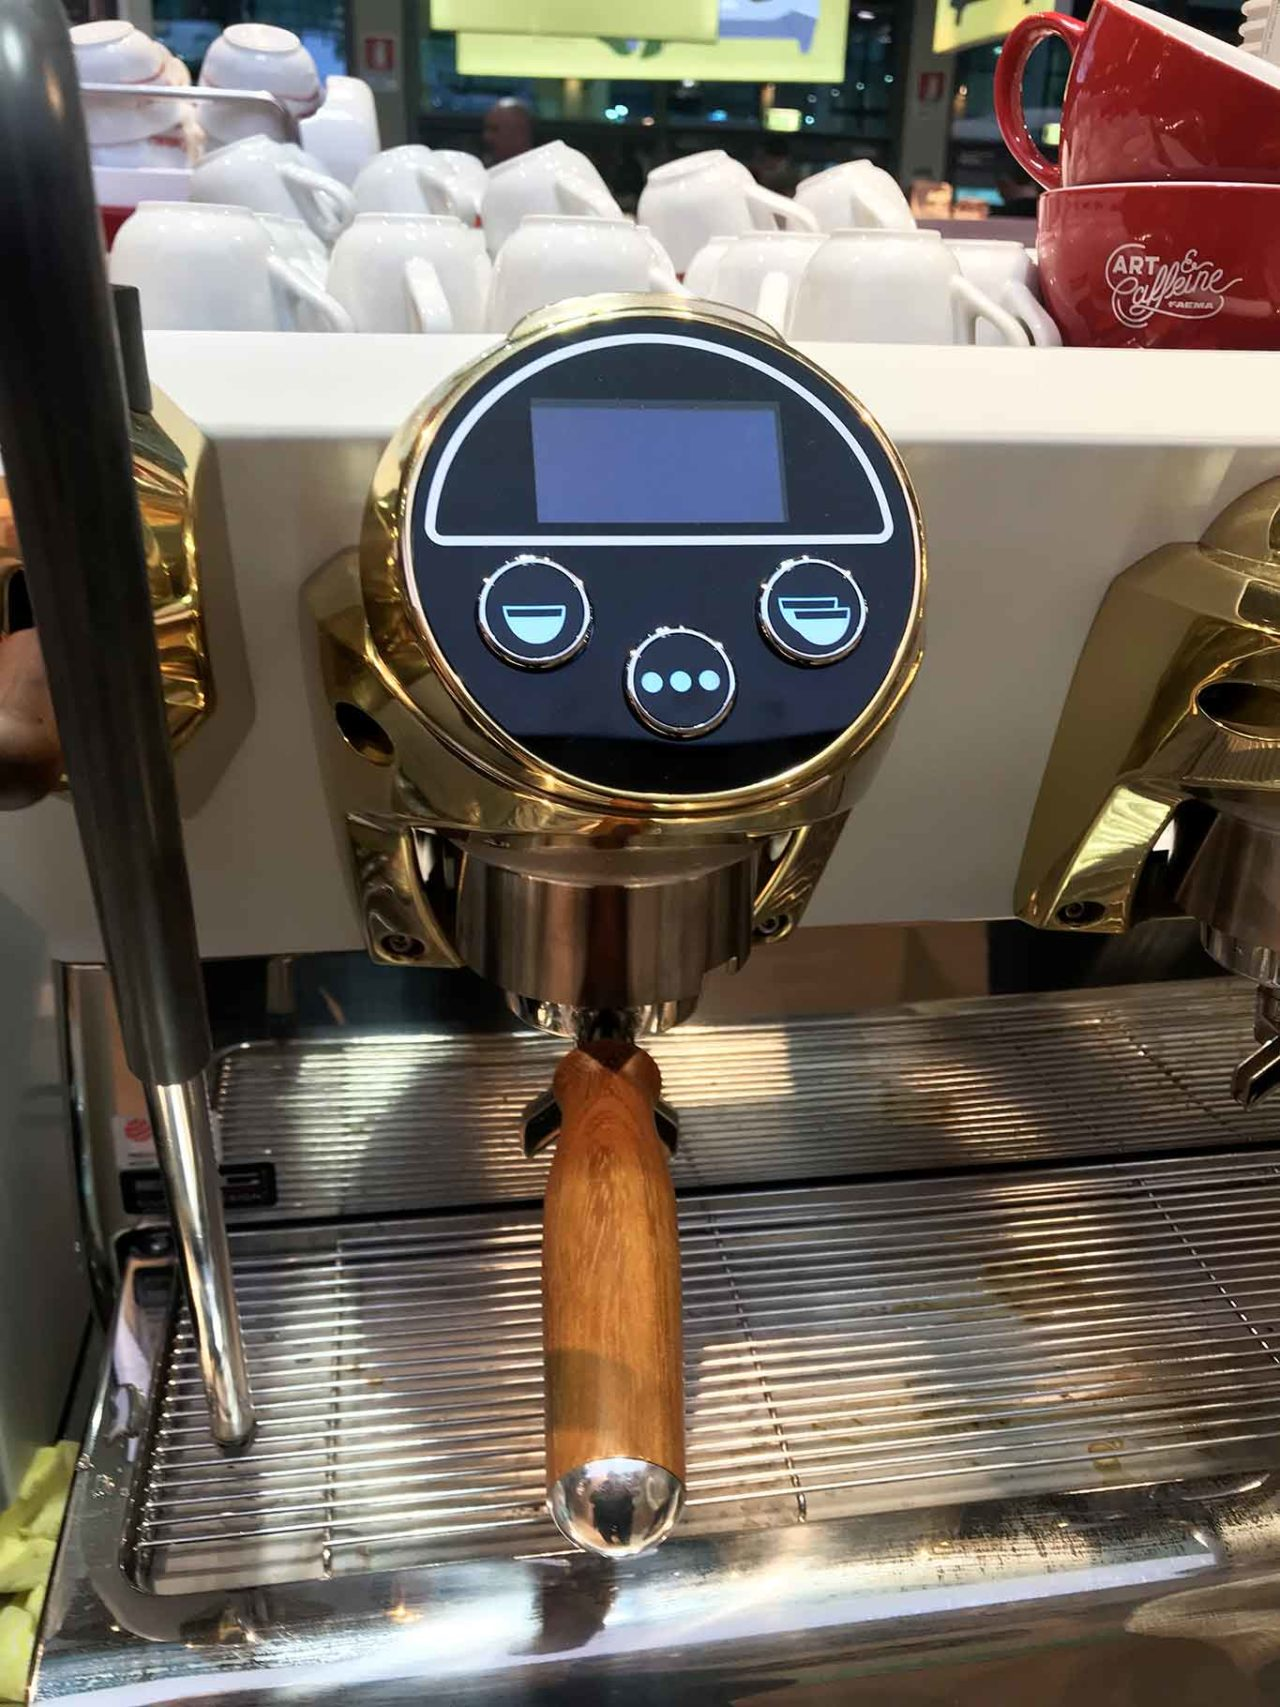 "machine à expresso ""class ="" wp-image-270146 ""srcset ="" https://www.shop-ici-ailleurs.com/wp-content/uploads/2020/02/1582907279_25_Cafe.-Qui-a-invente-l39espresso.jpg 1280w, https : //www.scattidigusto.it/wp-content/uploads/2020/02/macchina-caffe-espresso-dettaglio-320x427.jpg 320w, https://www.scattidigusto.it/wp-content/uploads/2020/ 02 / machine à café expresso-détail-80x106.jpg 80w, https://www.scattidigusto.it/wp-content/uploads/2020/02/machine-caffe-espresso-detail-768x1024.jpg 768w, https: //www.scattidigusto.it/wp-content/uploads/2020/02/macchina-caffe-espresso-dettaglio-1152x1536.jpg 1152w, https://www.scattidigusto.it/wp-content/uploads/2020/02 /macchina-caffe-espresso-dettaglio-696x928.jpg 696w, https://www.scattidigusto.it/wp-content/uploads/2020/02/macchina-caffe-espresso-dettaglio-1068x1424.jpg 1068w, https: / /www.scattidigusto.it/wp-content/uploads/2020/02/macchina-caffe-espresso-dettaglio-315x420.jpg 315w, https://www.scattidigusto.it/wp-content/uploads/2020/02/ machine à café -espresso-detail-960x1280.jpg 960w, https://www.scattidigusto.it/wp-content/uploads/2020/02/machine-caffe-espresso-detail.jpg 1365w ""tailles ="" (largeur max: 1280px ) 100vw, 1280px"